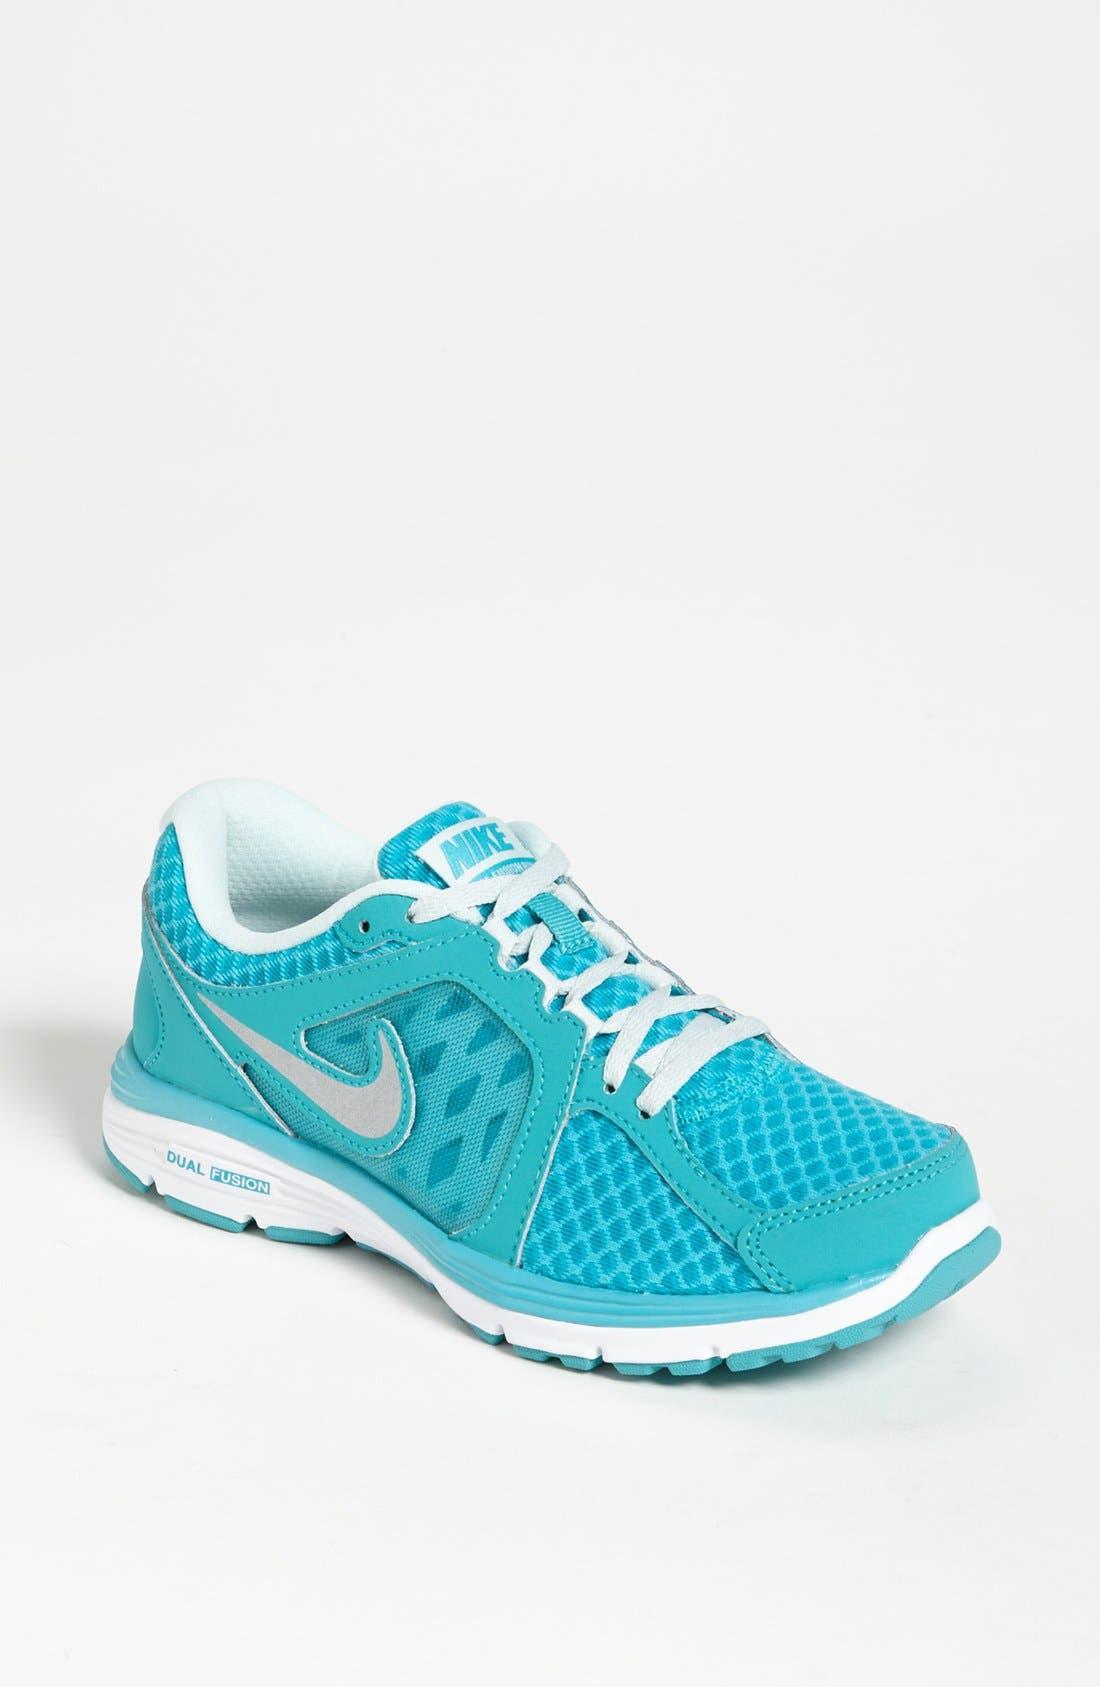 Alternate Image 1 Selected - Nike 'Dual Fusion Run Breathe' Running Shoe (Women)